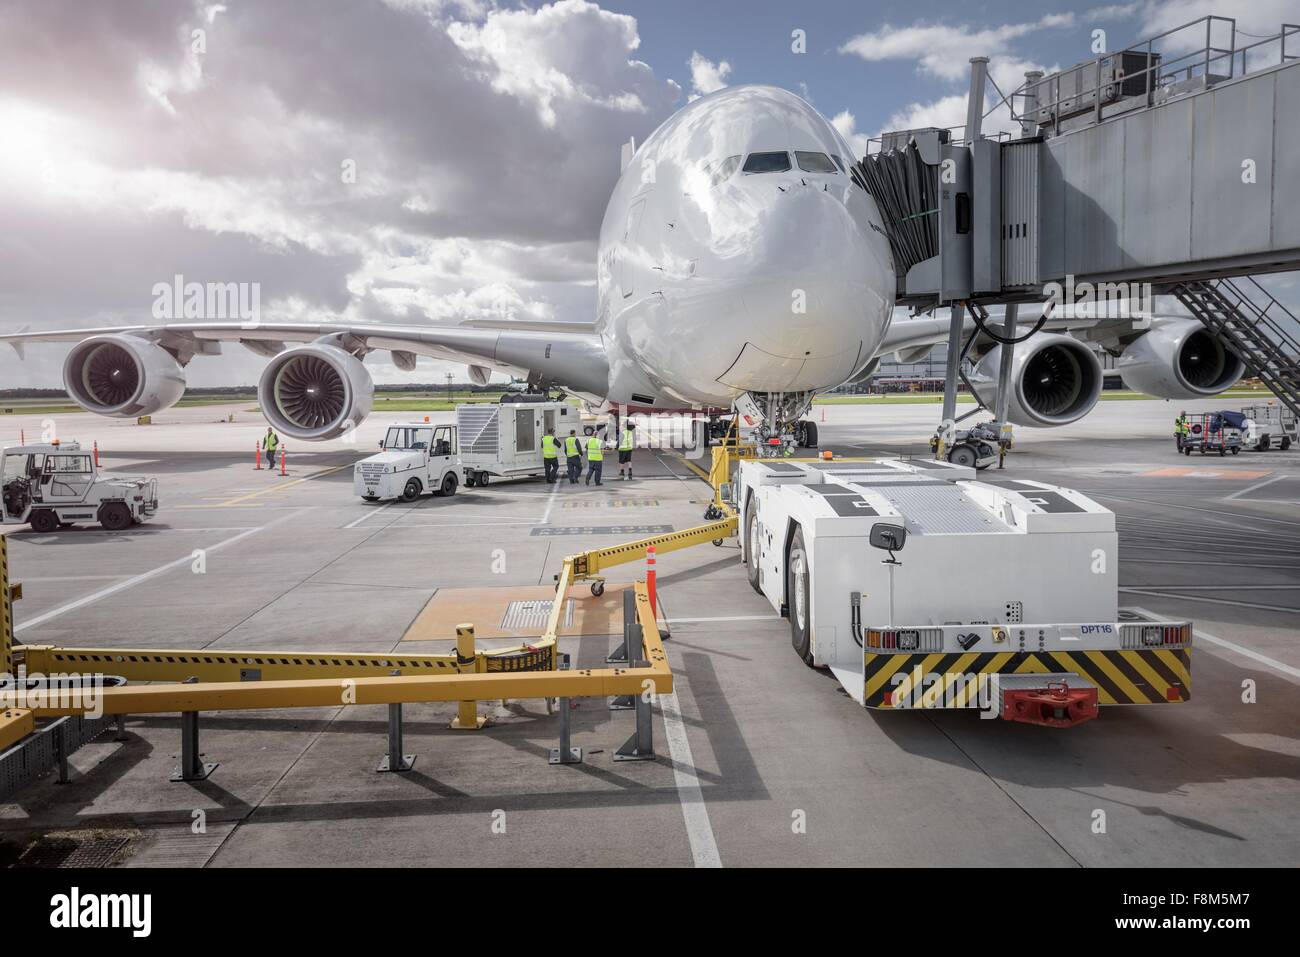 Bodenpersonal Lademittel auf A380-Flugzeuge in Betrieb Stockbild